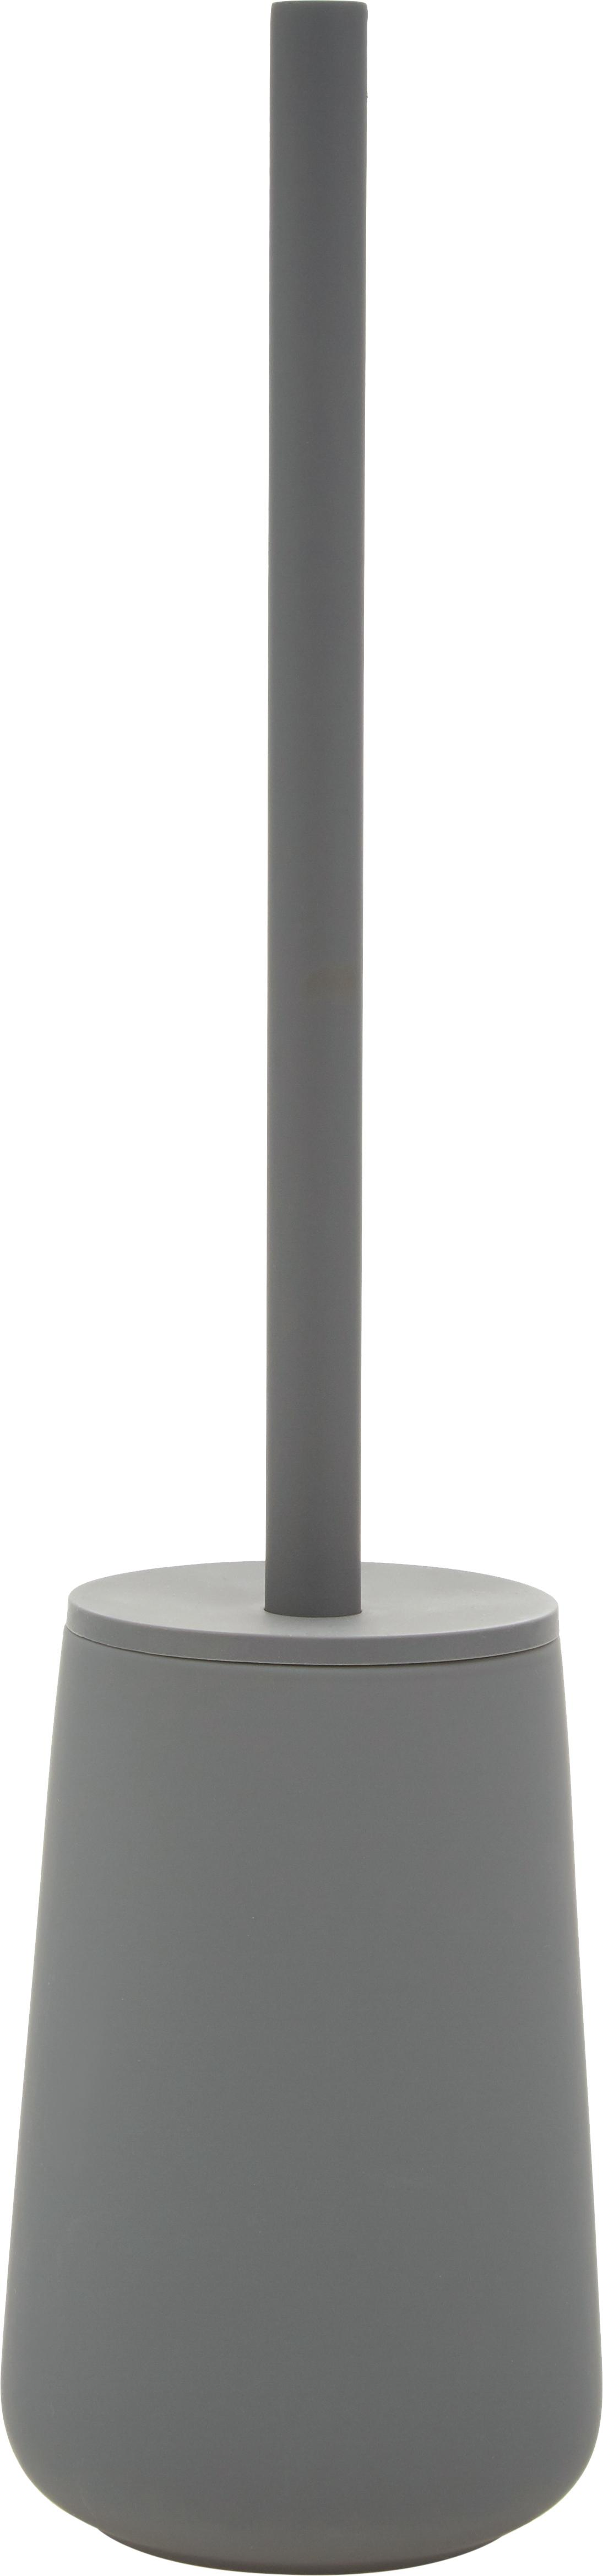 Escobilla de baño Nova One, Recipiente: porcelana, Gris, Ø 10 x Al 43 cm